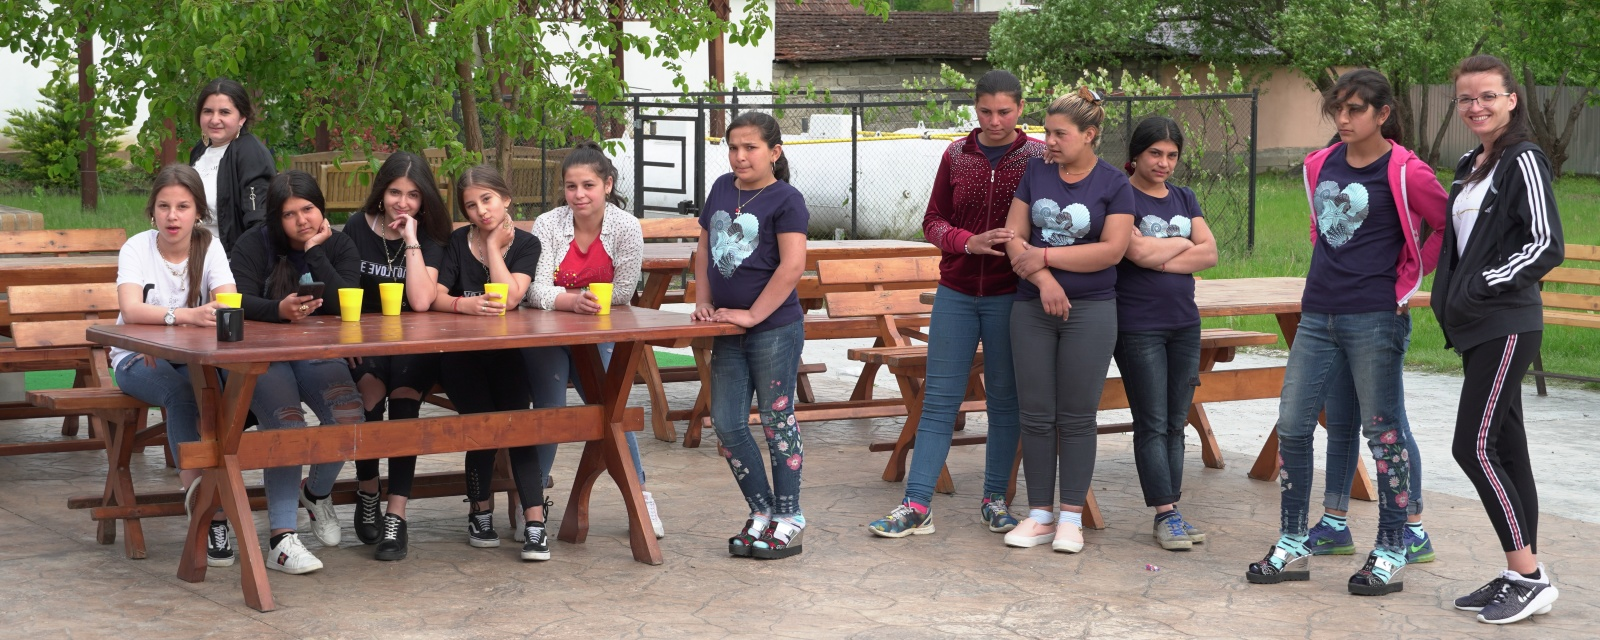 Tileagd Group at Dezna